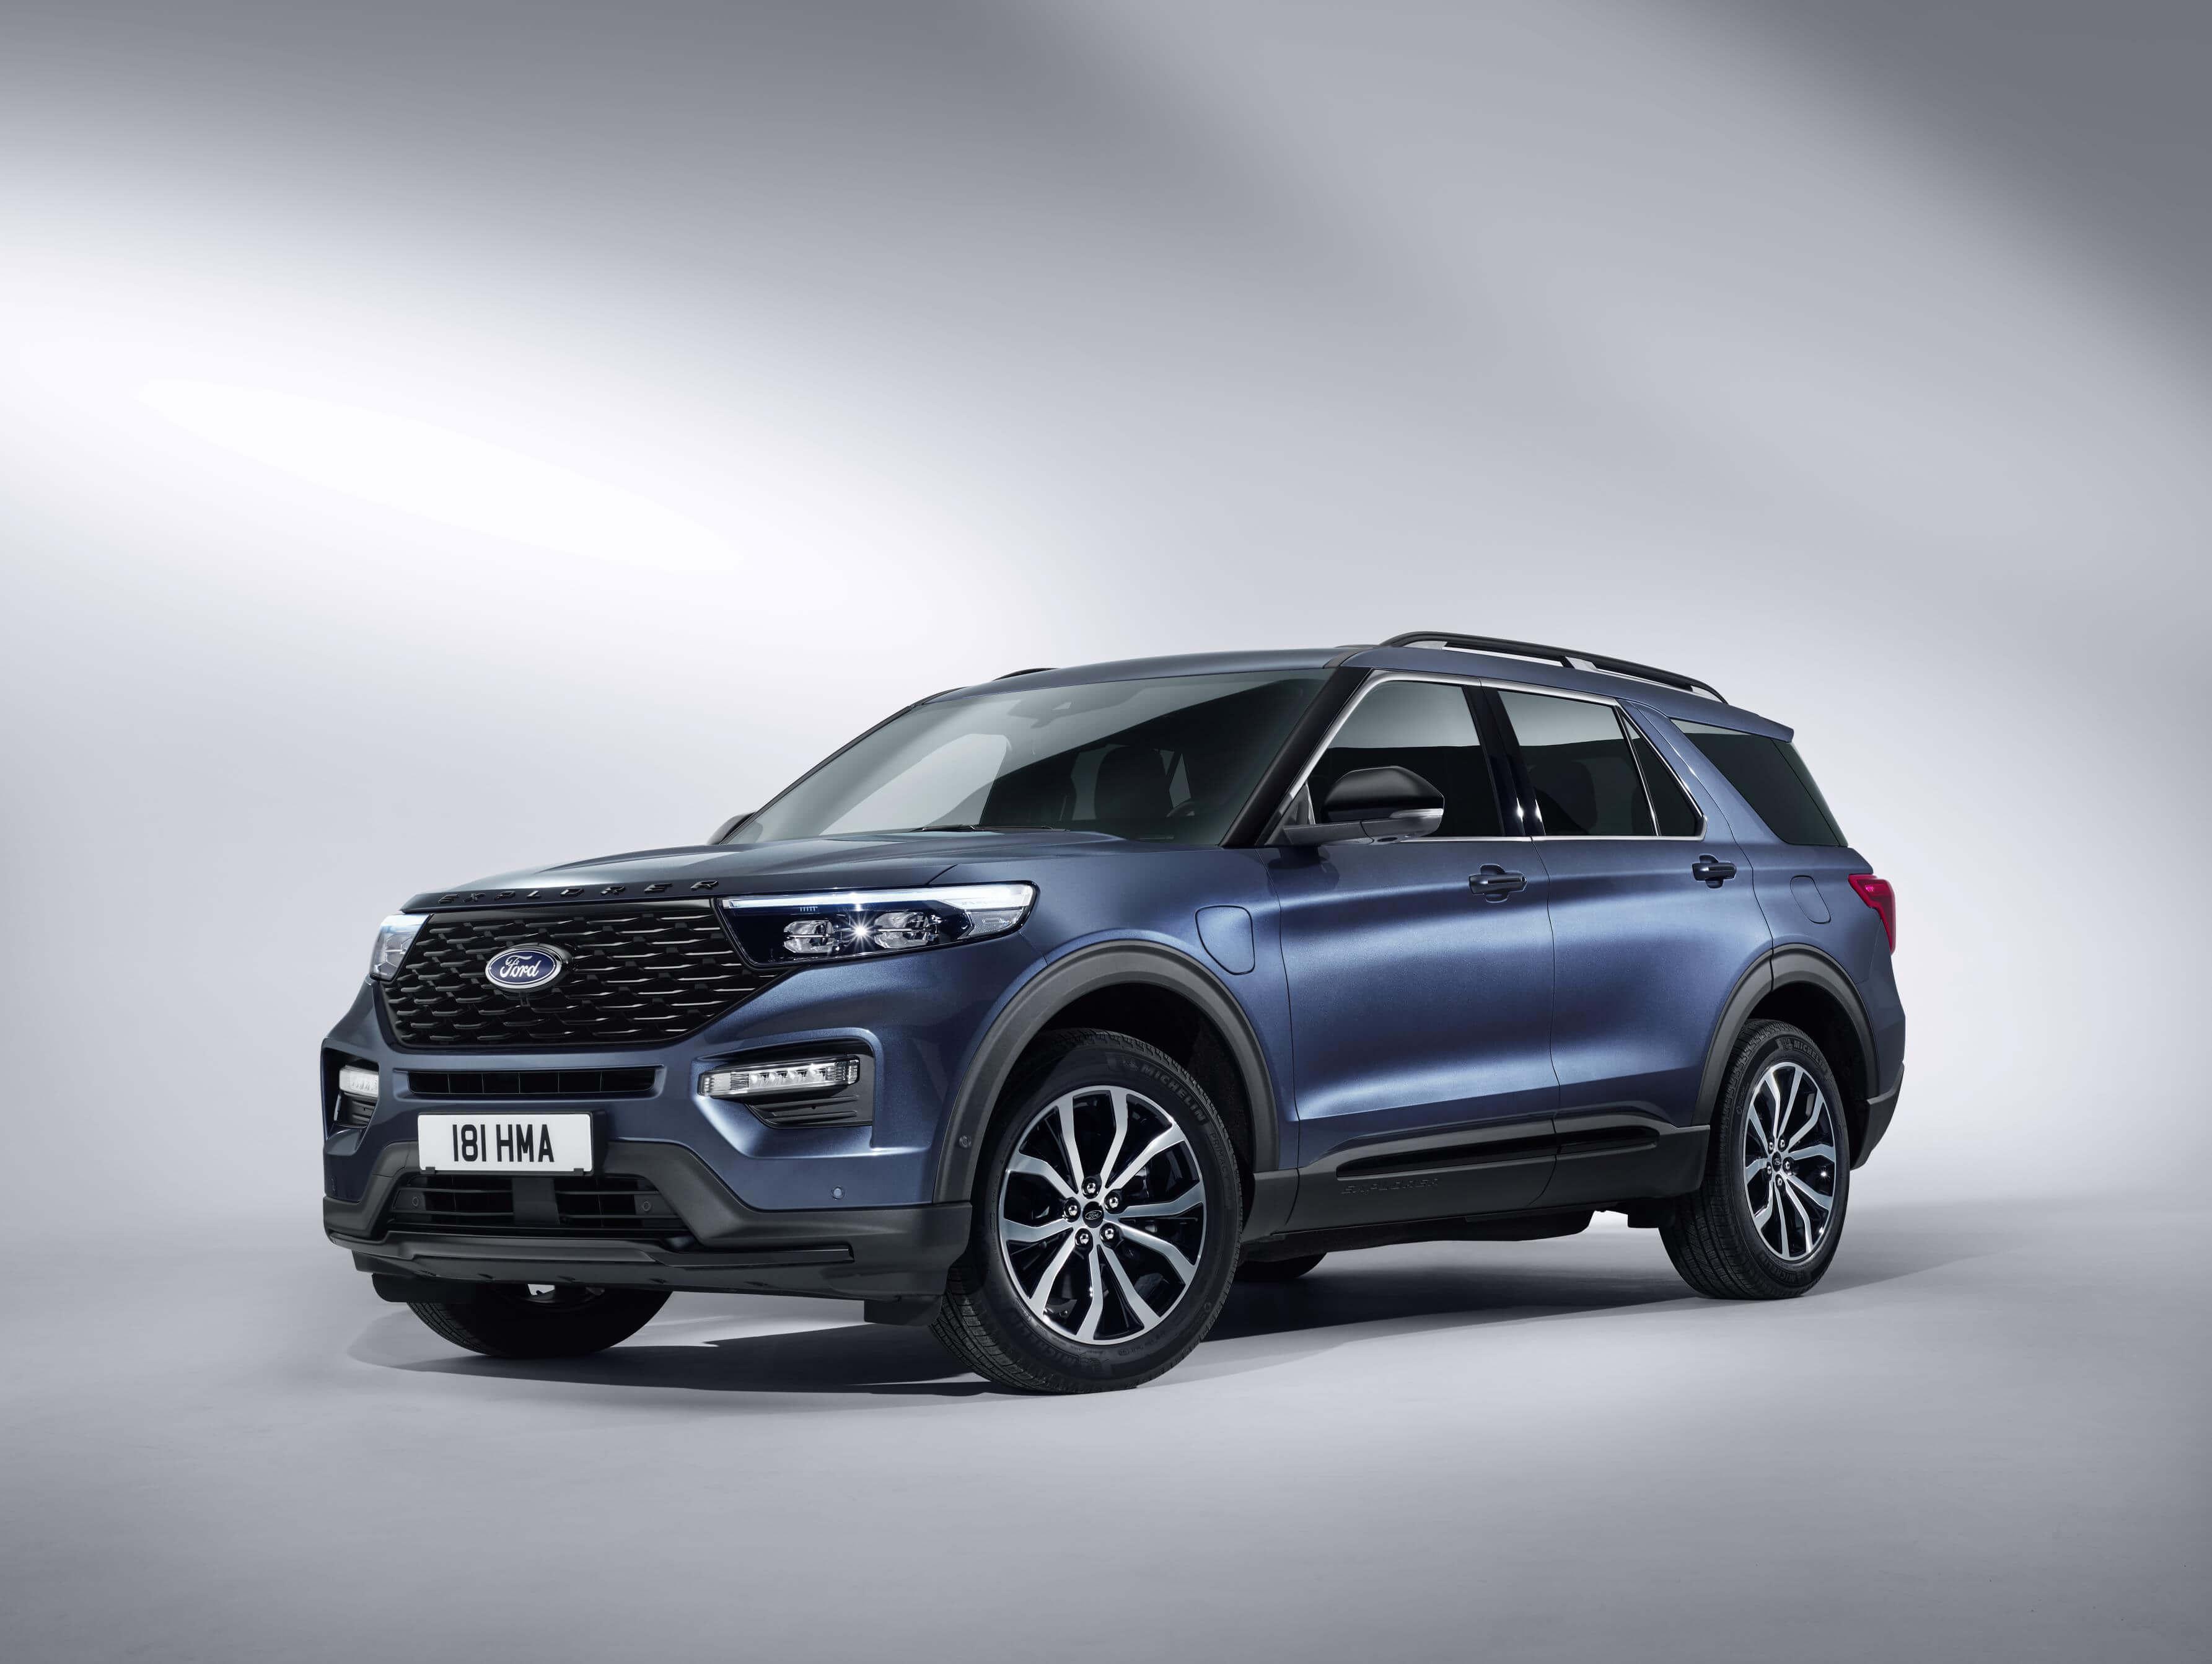 El Ford Explorer 2019 llegará a Europa como híbrido enchufable